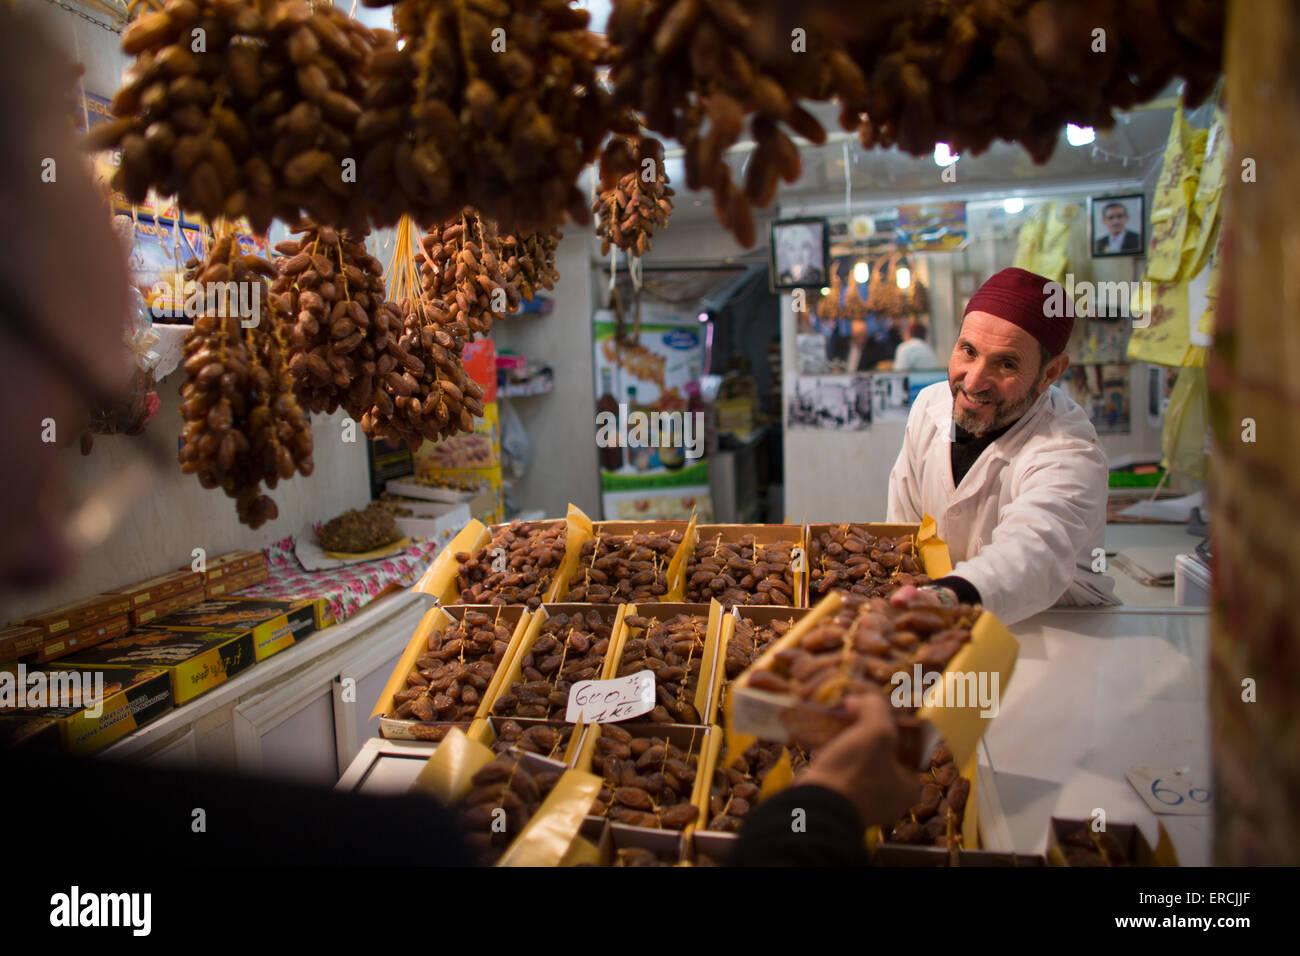 Mercado en Argel, Argelia Imagen De Stock